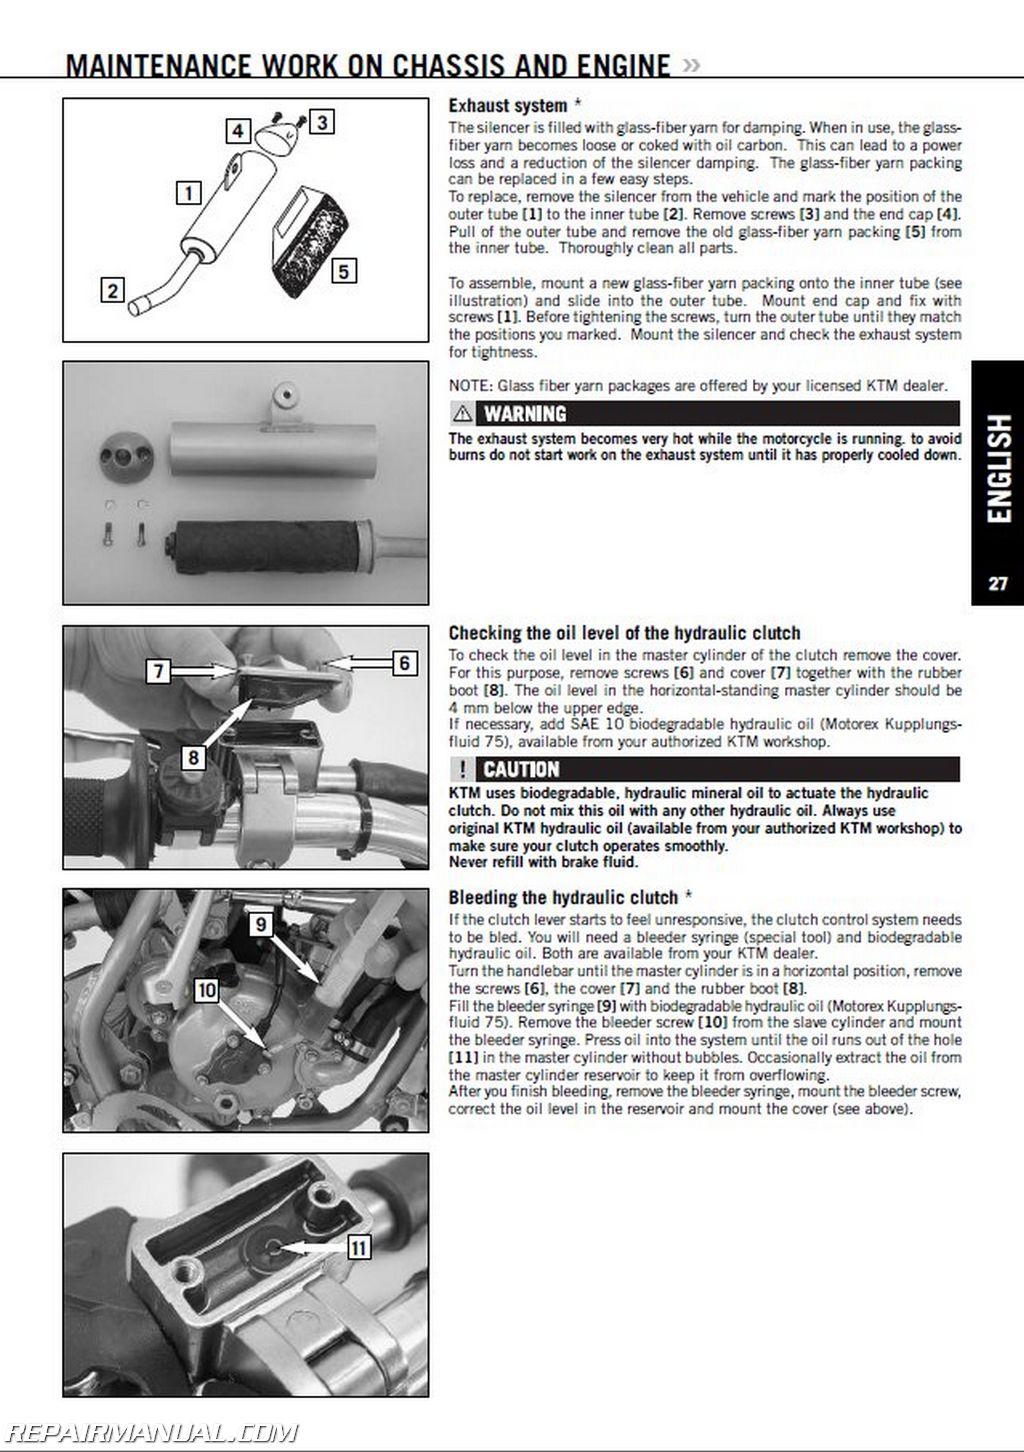 1998 2008 ktm 60sx 65sx 65xc repair manuals on cd rom. Black Bedroom Furniture Sets. Home Design Ideas